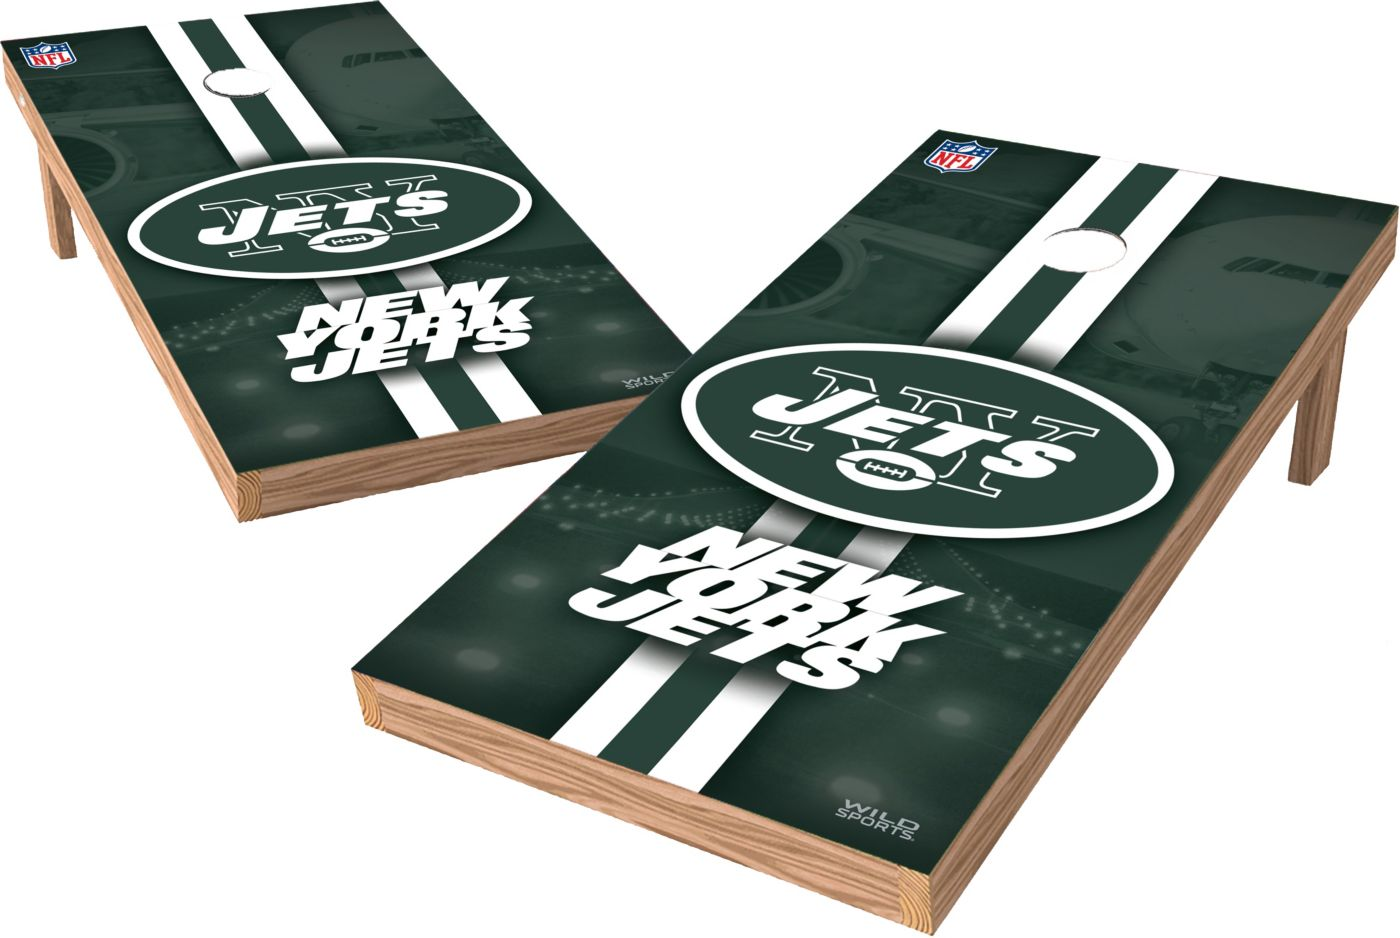 Wild Sports 2' x 4' New York Jets XL Tailgate Bean Bag Toss Shields